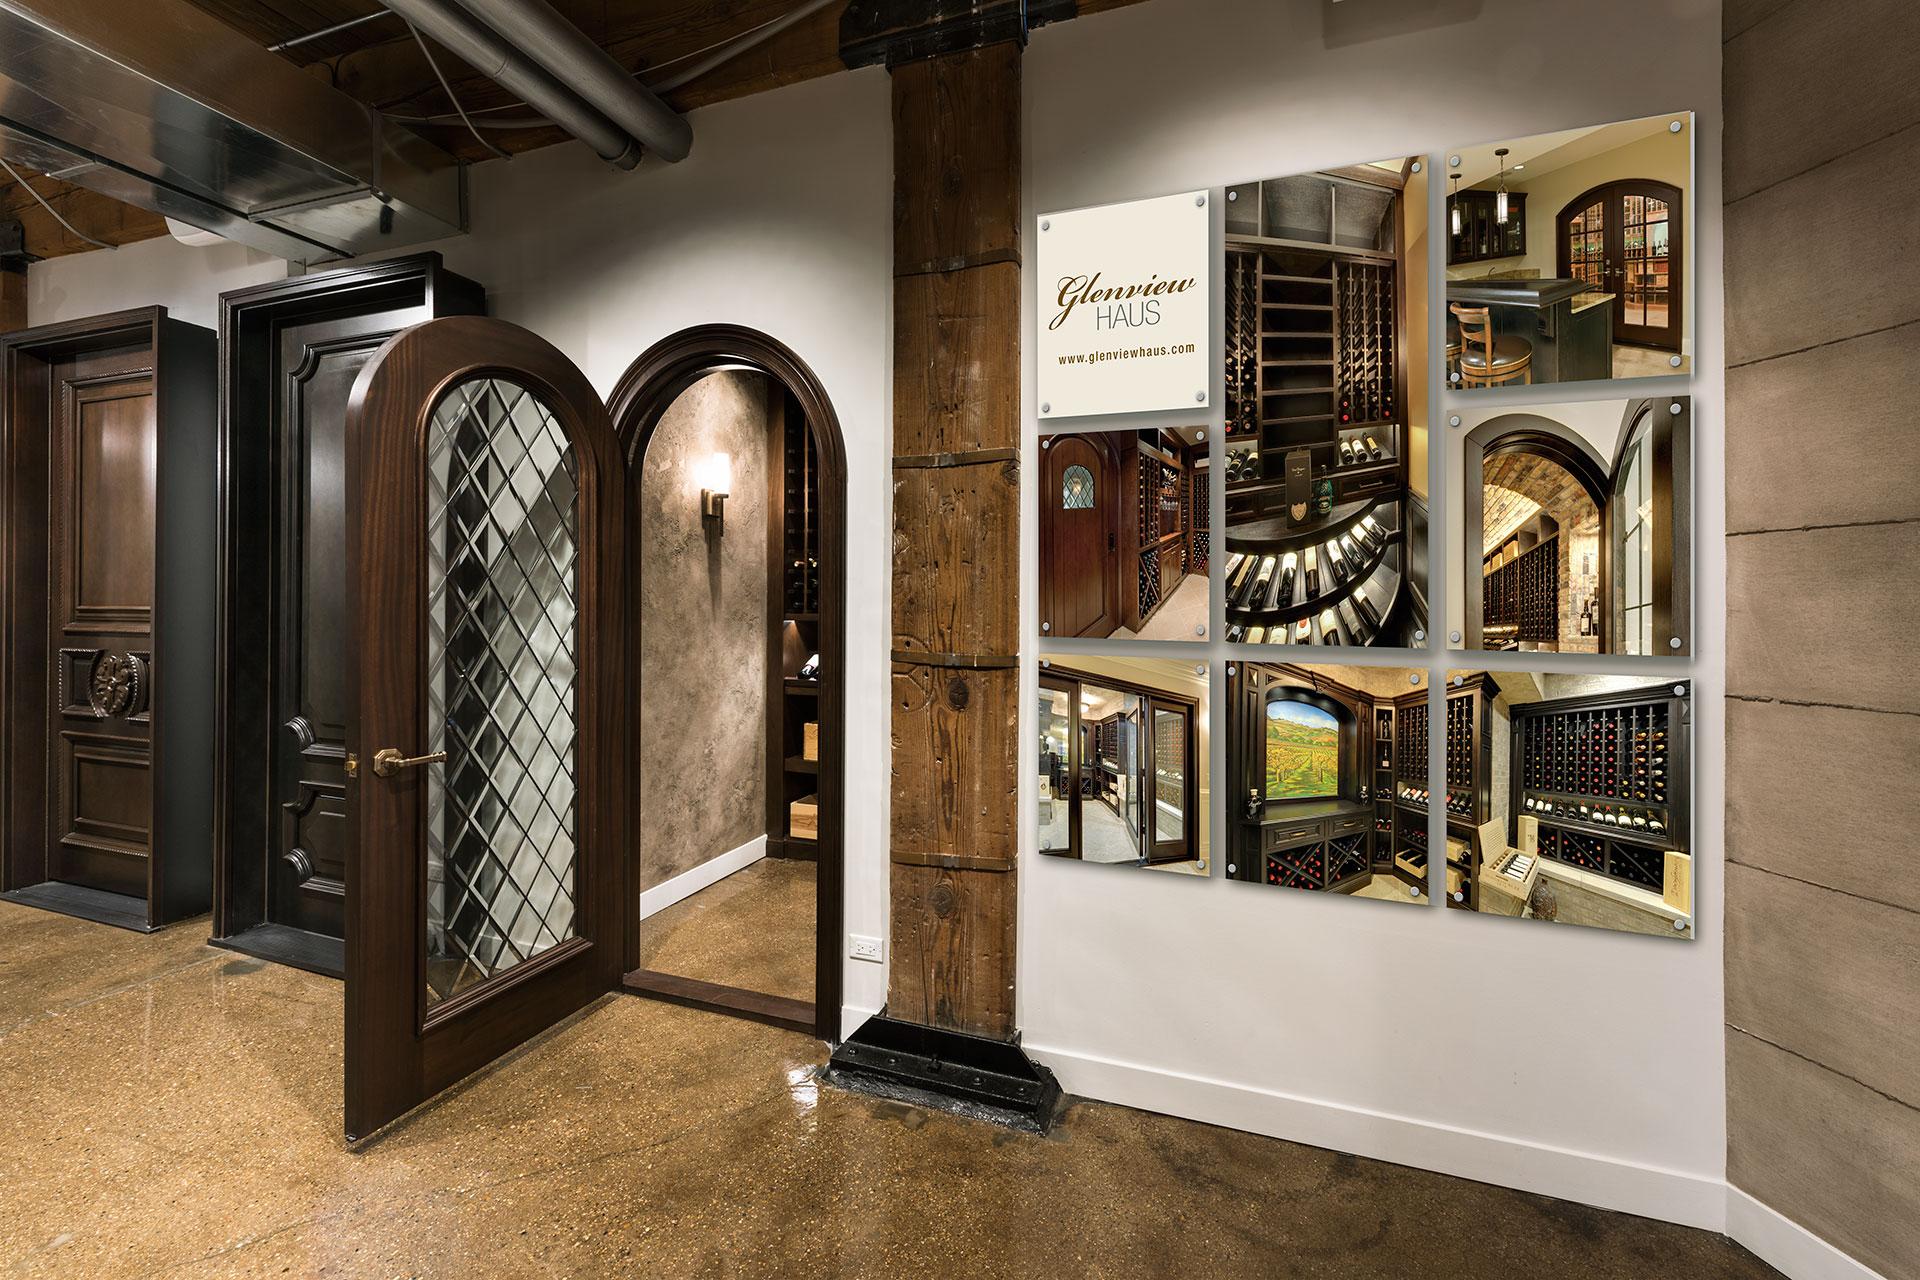 Glenview Haus - Custom Doors and Wine Cellars - Showroom & Glenview Haus Showroom | Custom Doors and Wine Cellars at Glenview ...